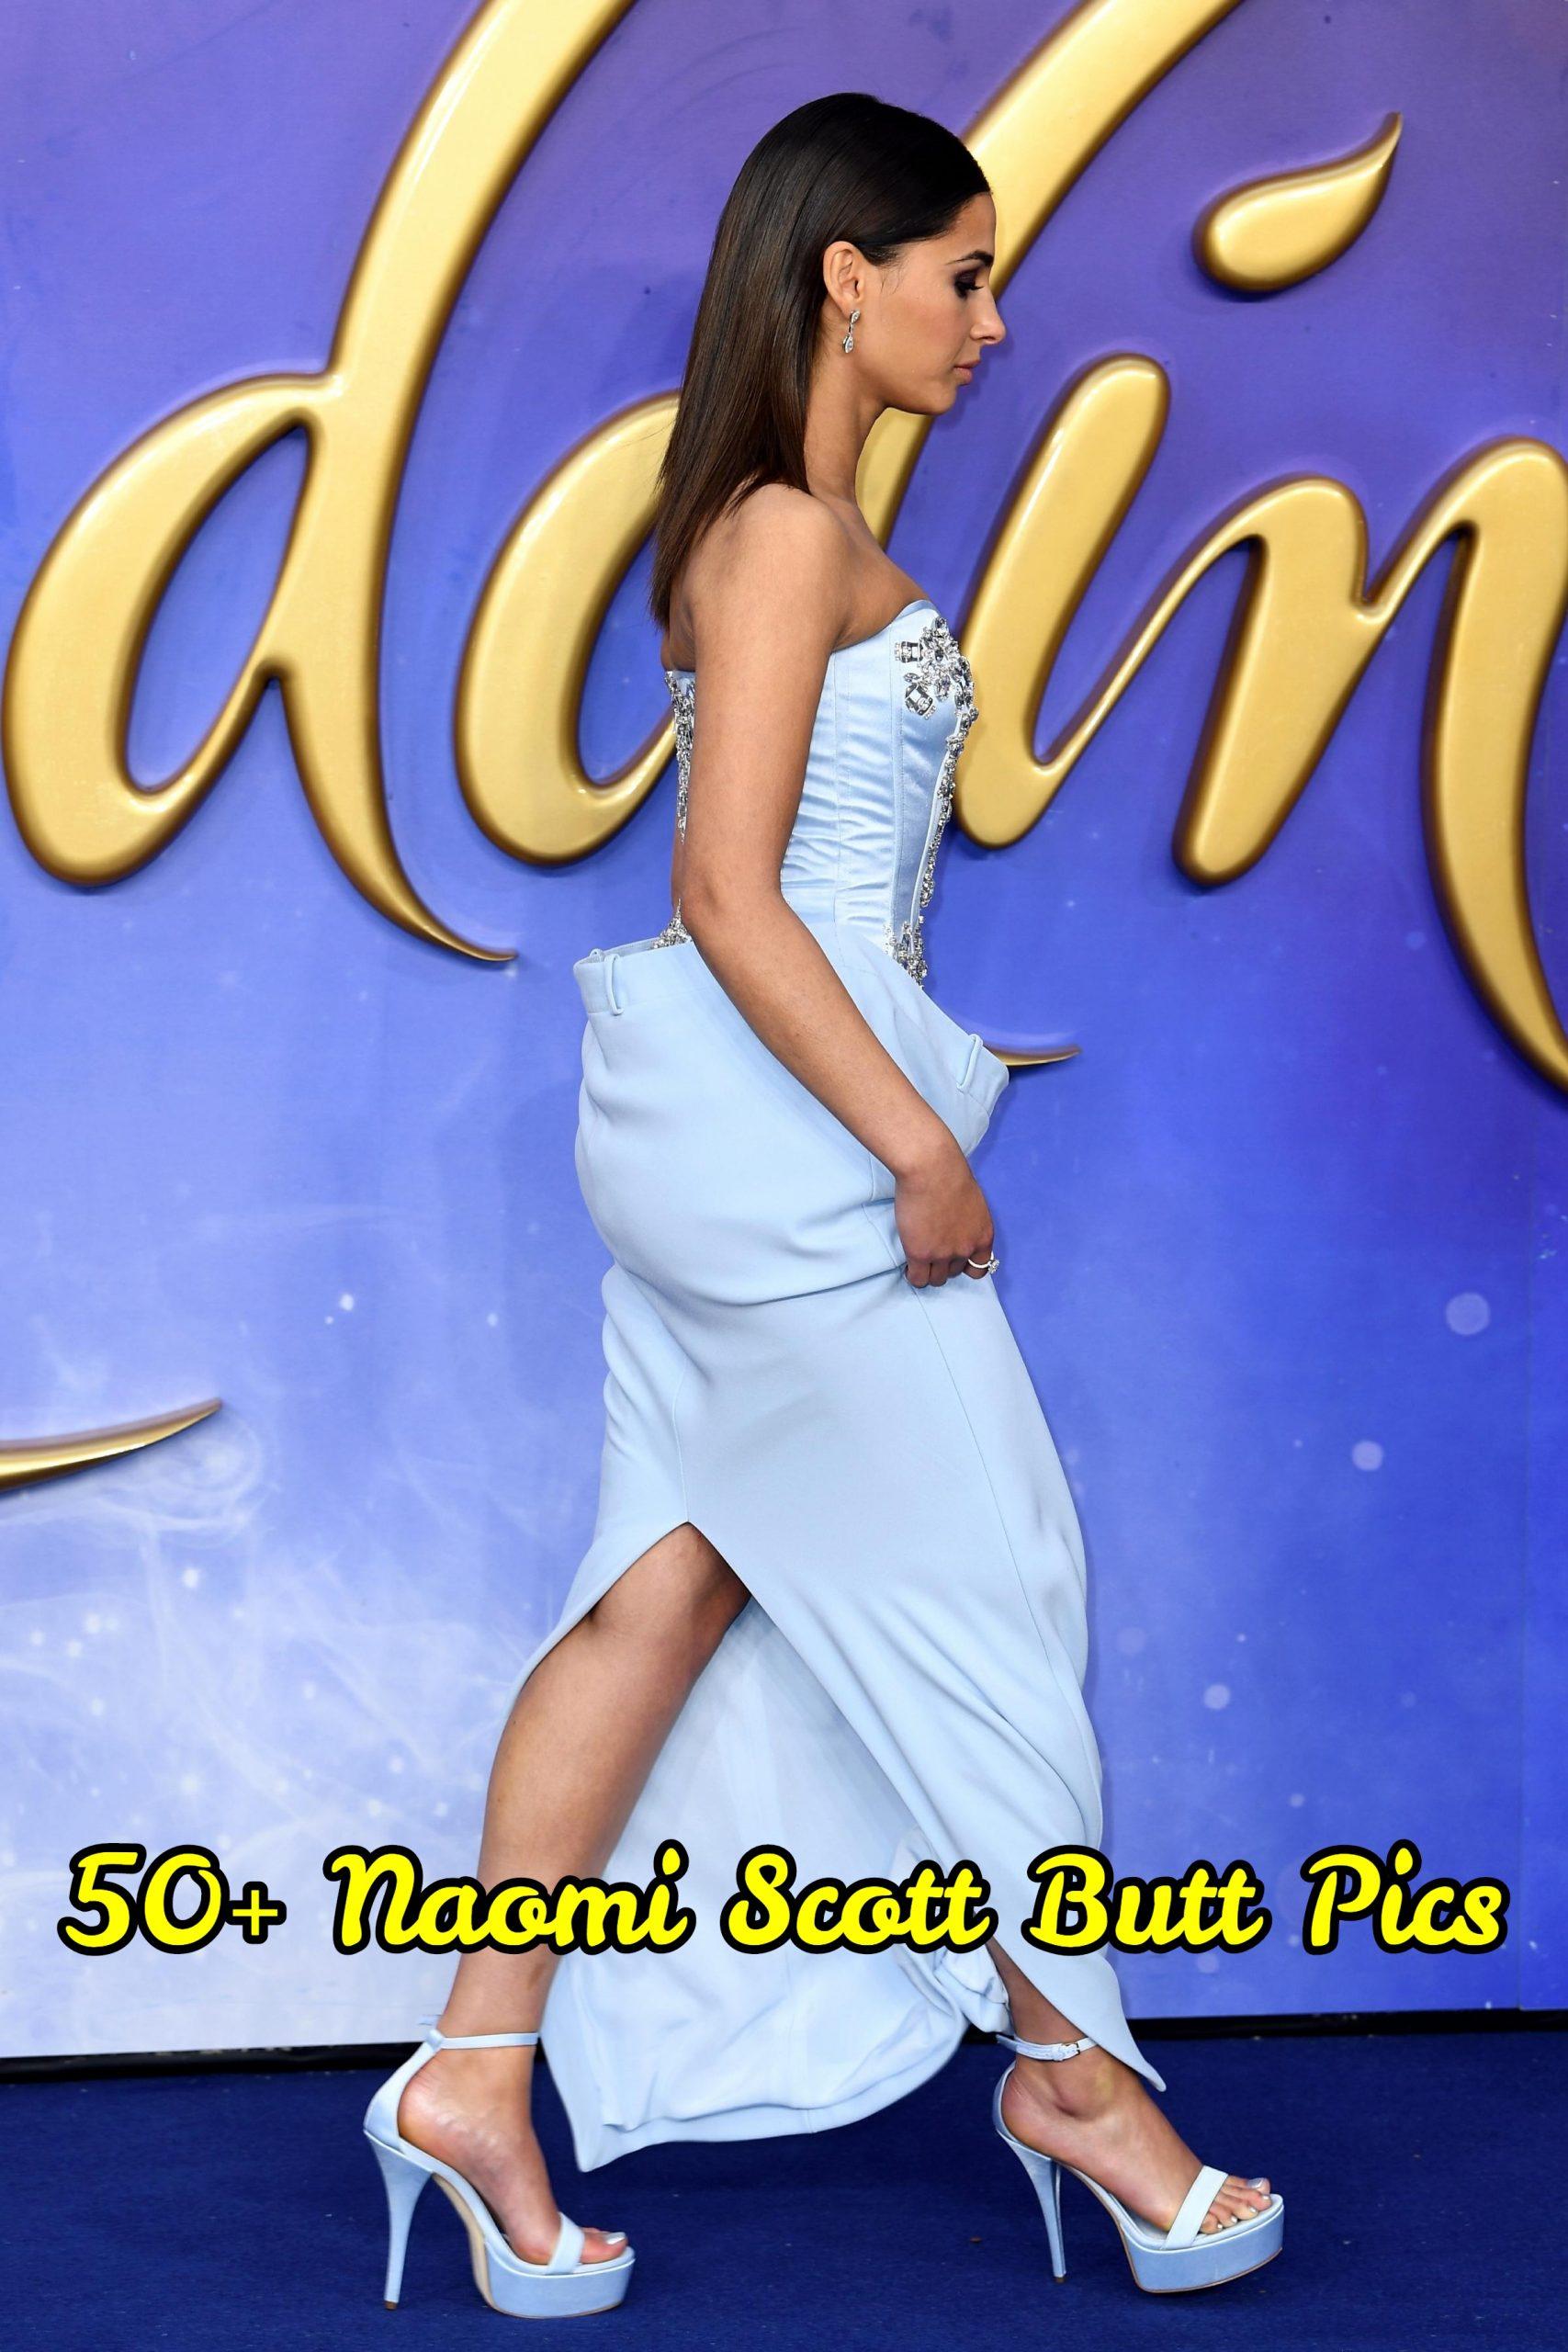 Naomi Scott ass pics